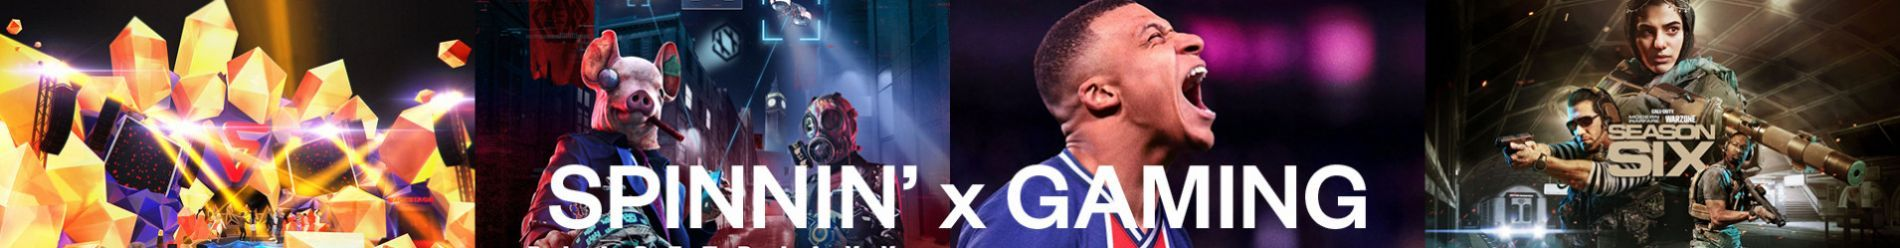 Spinnin' x Gaming